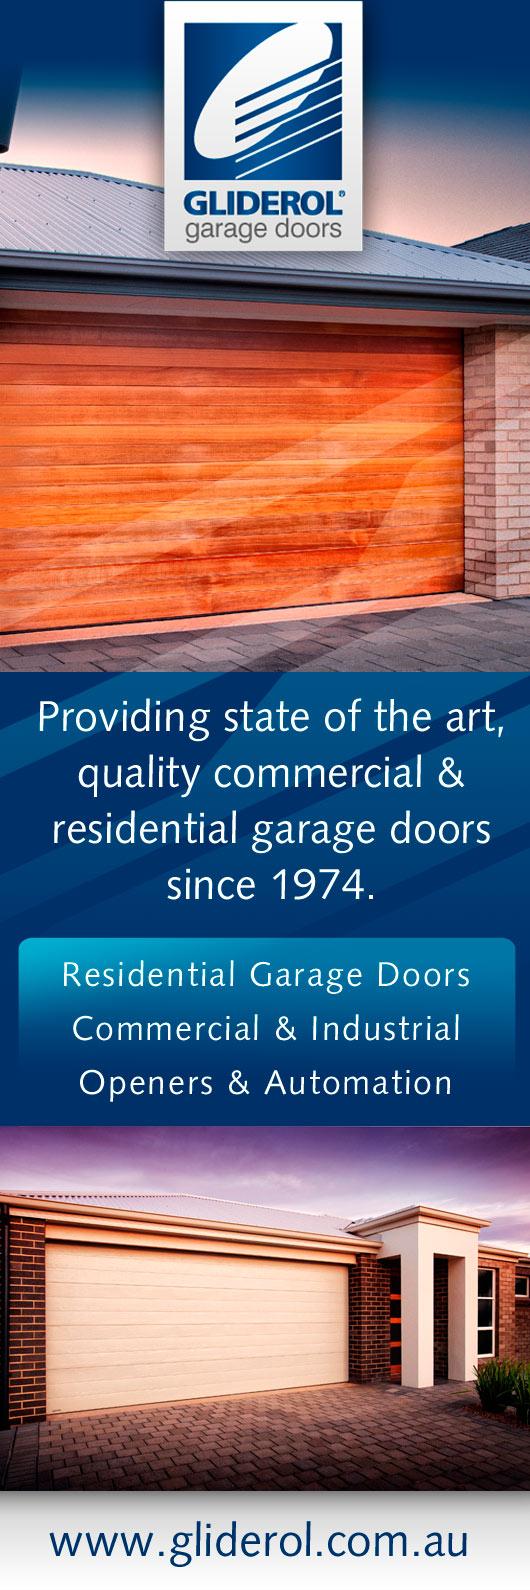 Gliderol Garage Doors - Promotion & Gliderol Garage Doors - Garage Doors \u0026 Fittings - NOWRA